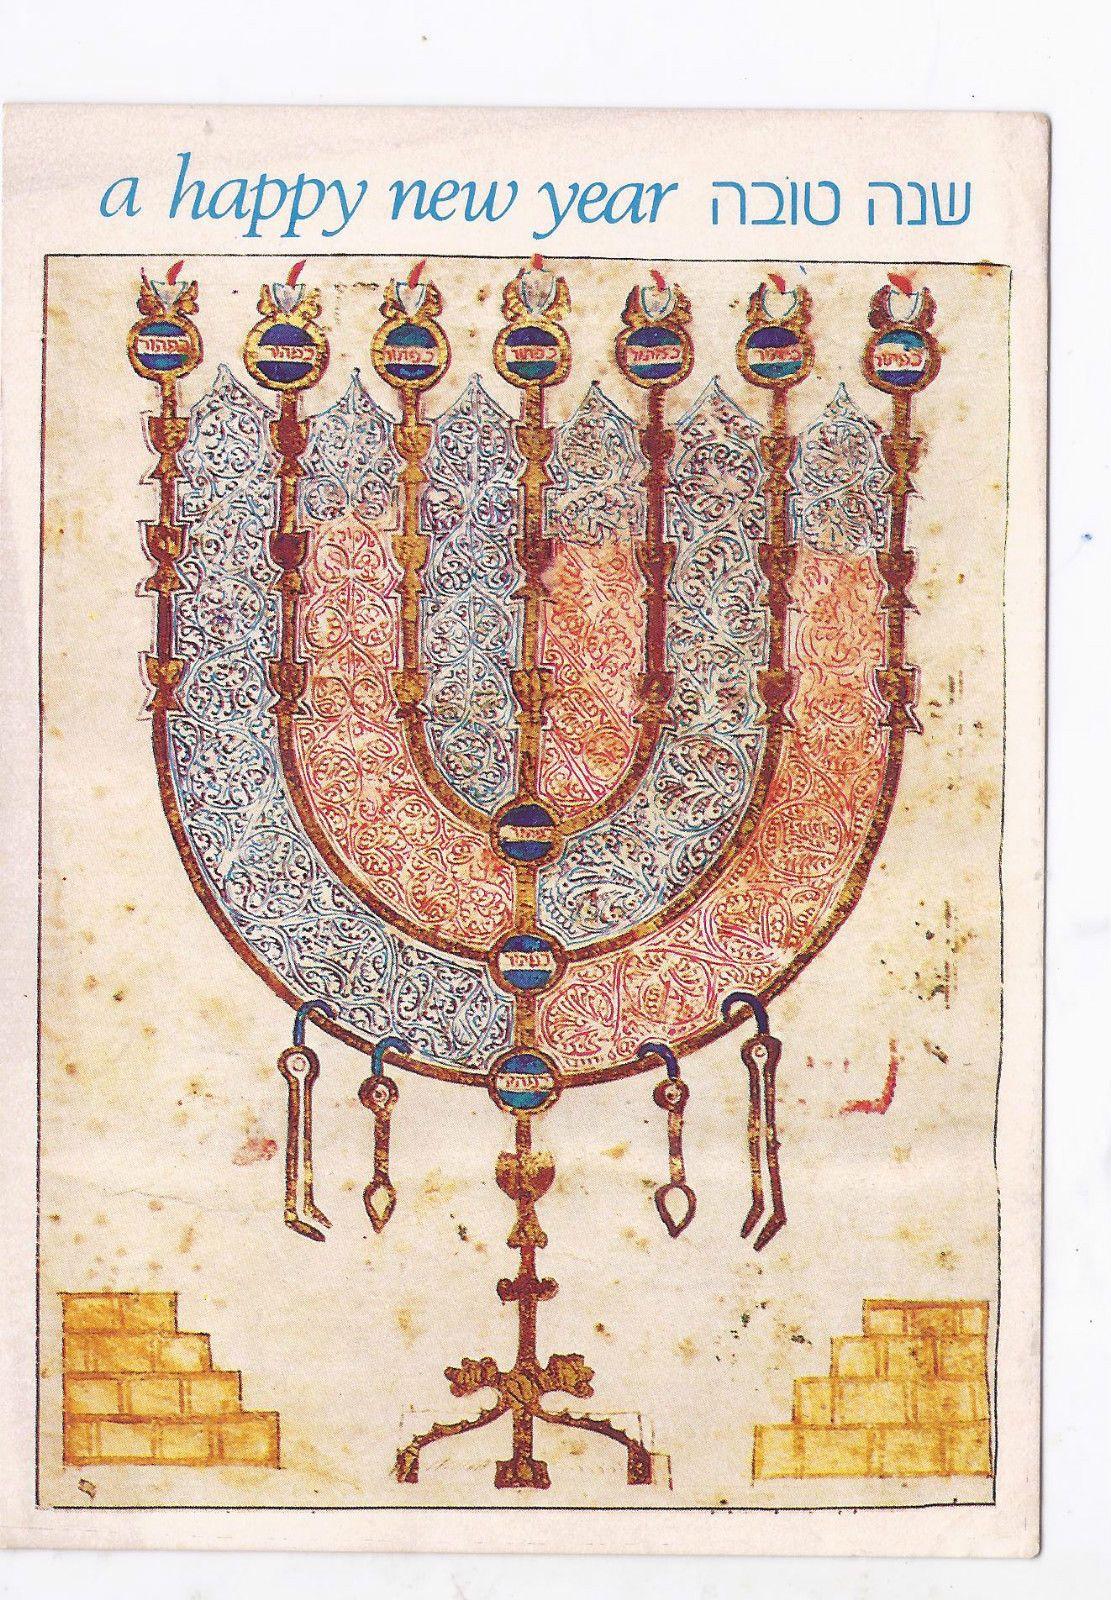 Judaica shana tova greeting card judaica pinterest judaism judaica shana tova greeting card kristyandbryce Images